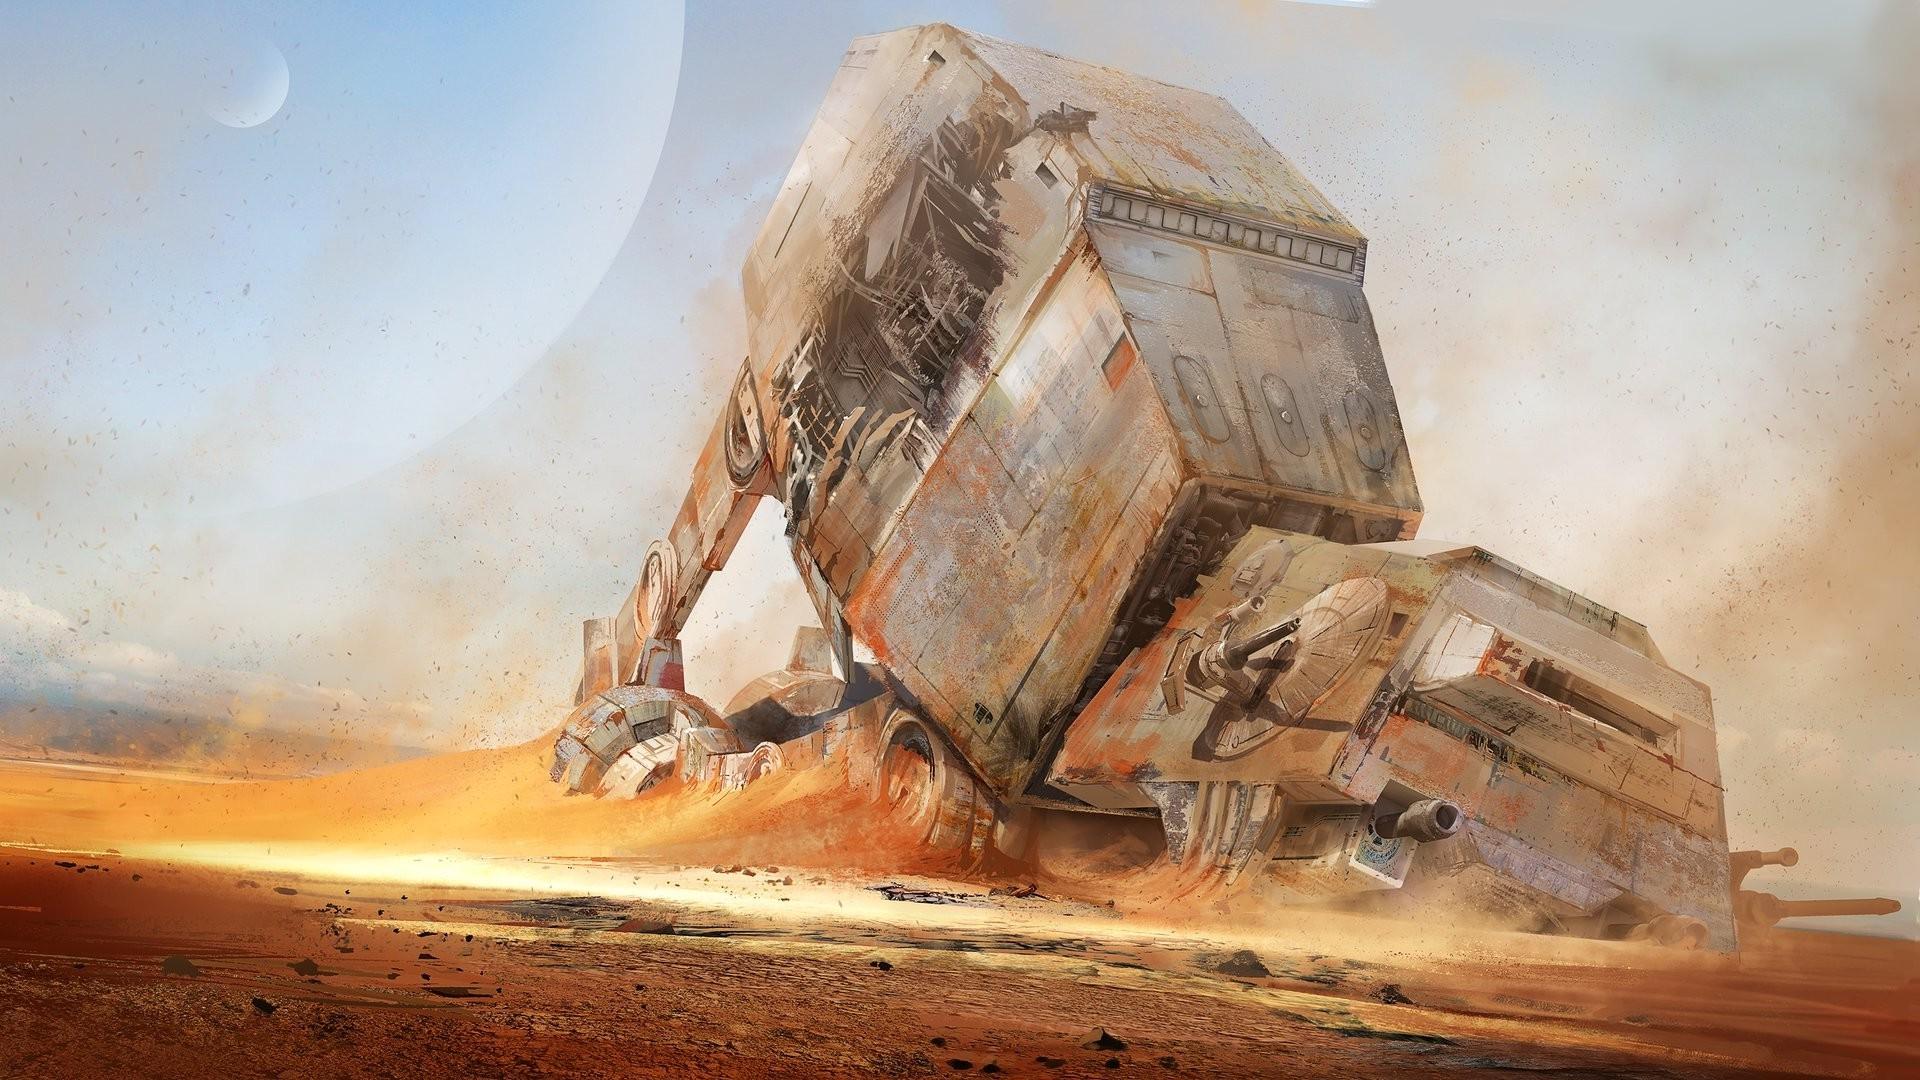 artwork, Concept Art, Star Wars, AT AT, Science Fiction, Digital Art,  Desert, Wreck Wallpapers HD / Desktop and Mobile Backgrounds